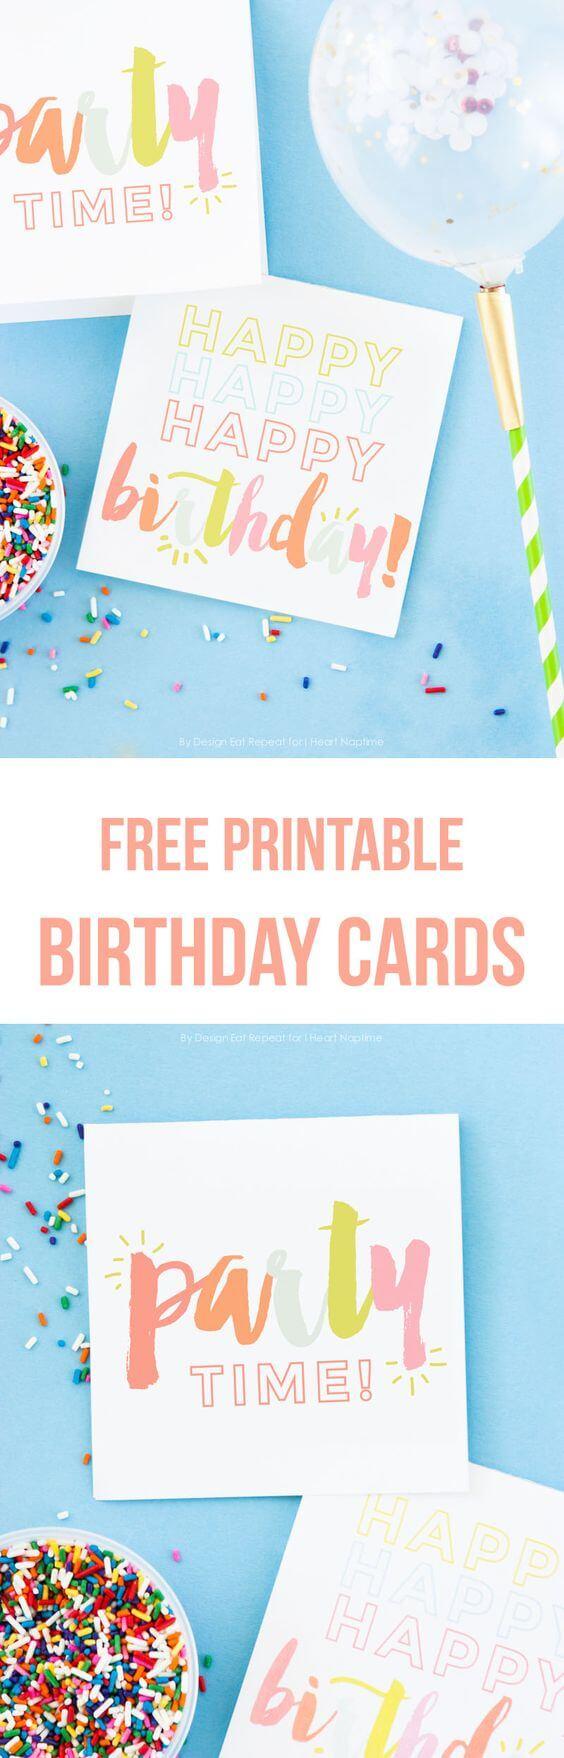 Adorable Free Printable Birthday Cards - I Heart Naptime - Free Printable Bday Cards